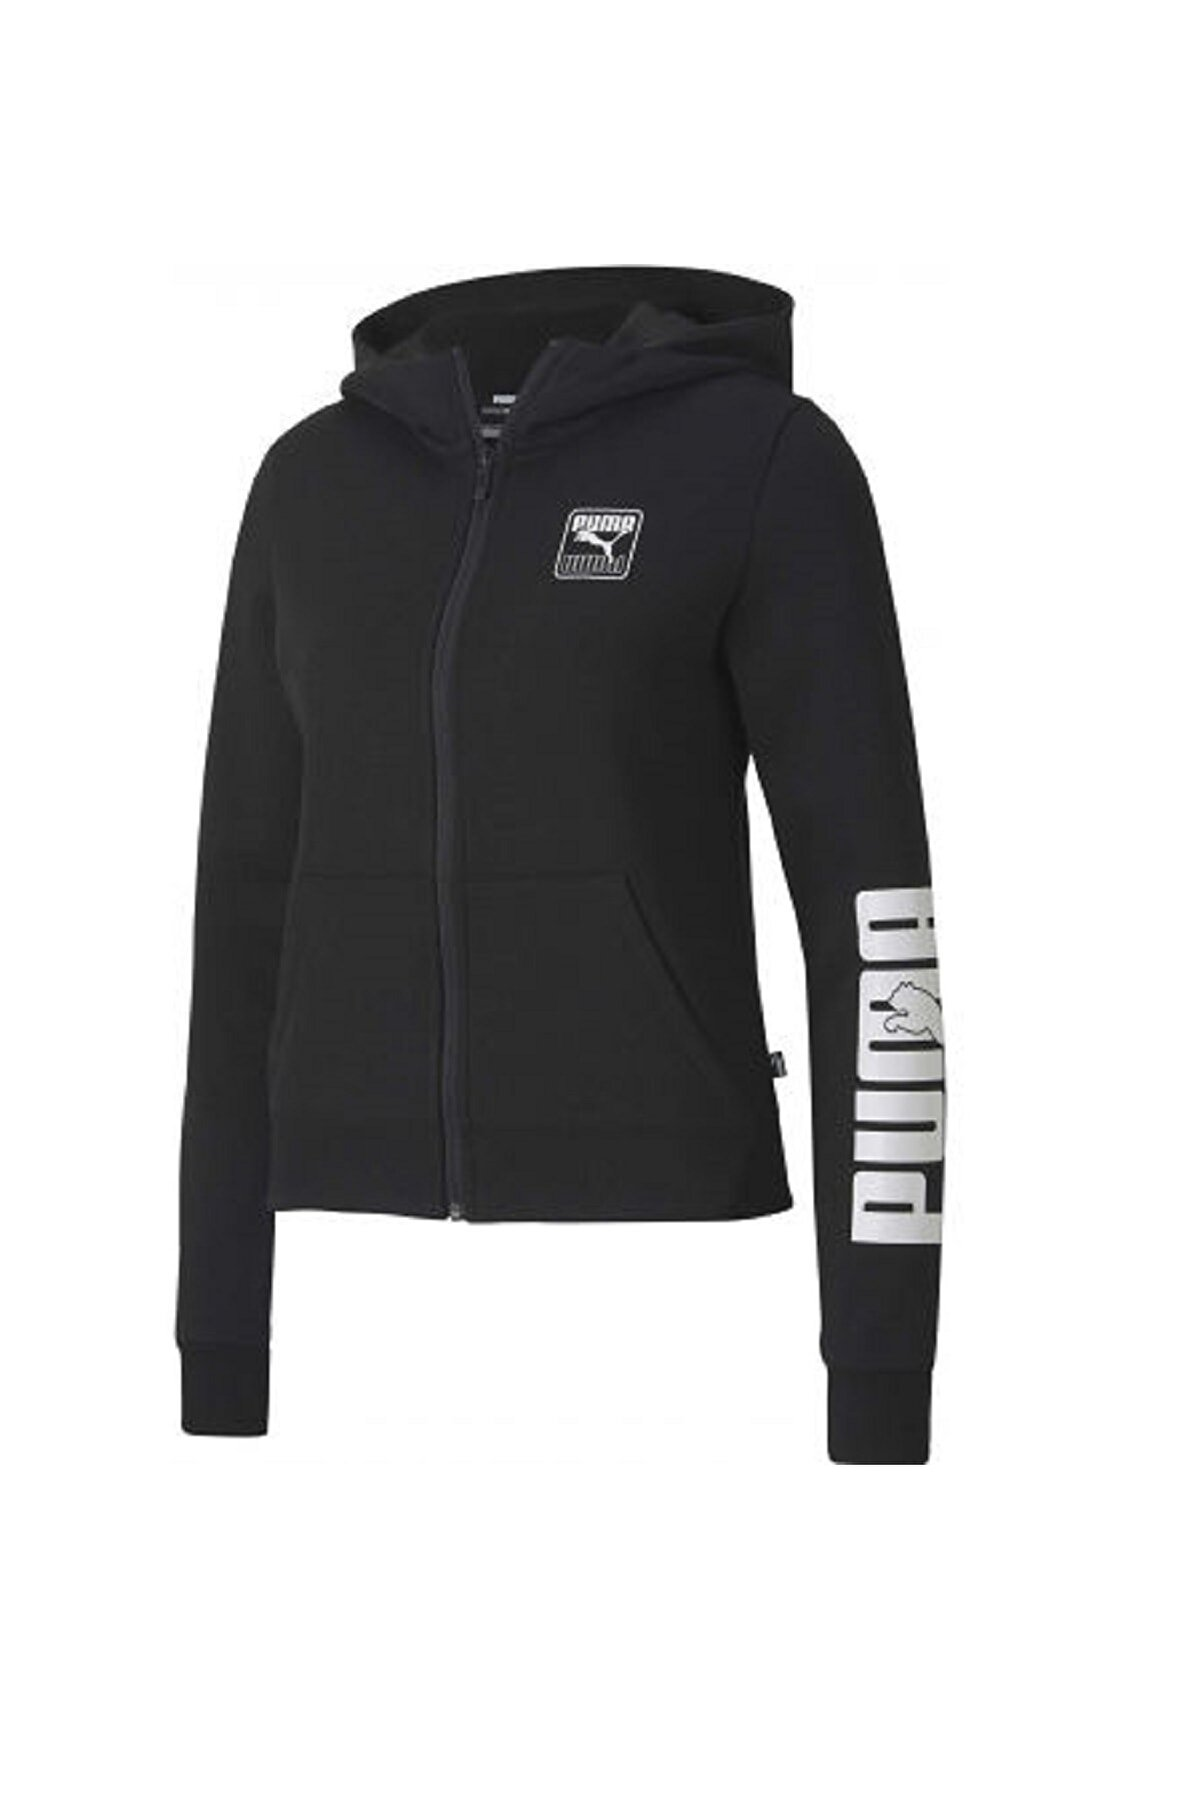 Puma Kadın Spor Sweatshirt - Rebel Full-Zip FL - 58356701